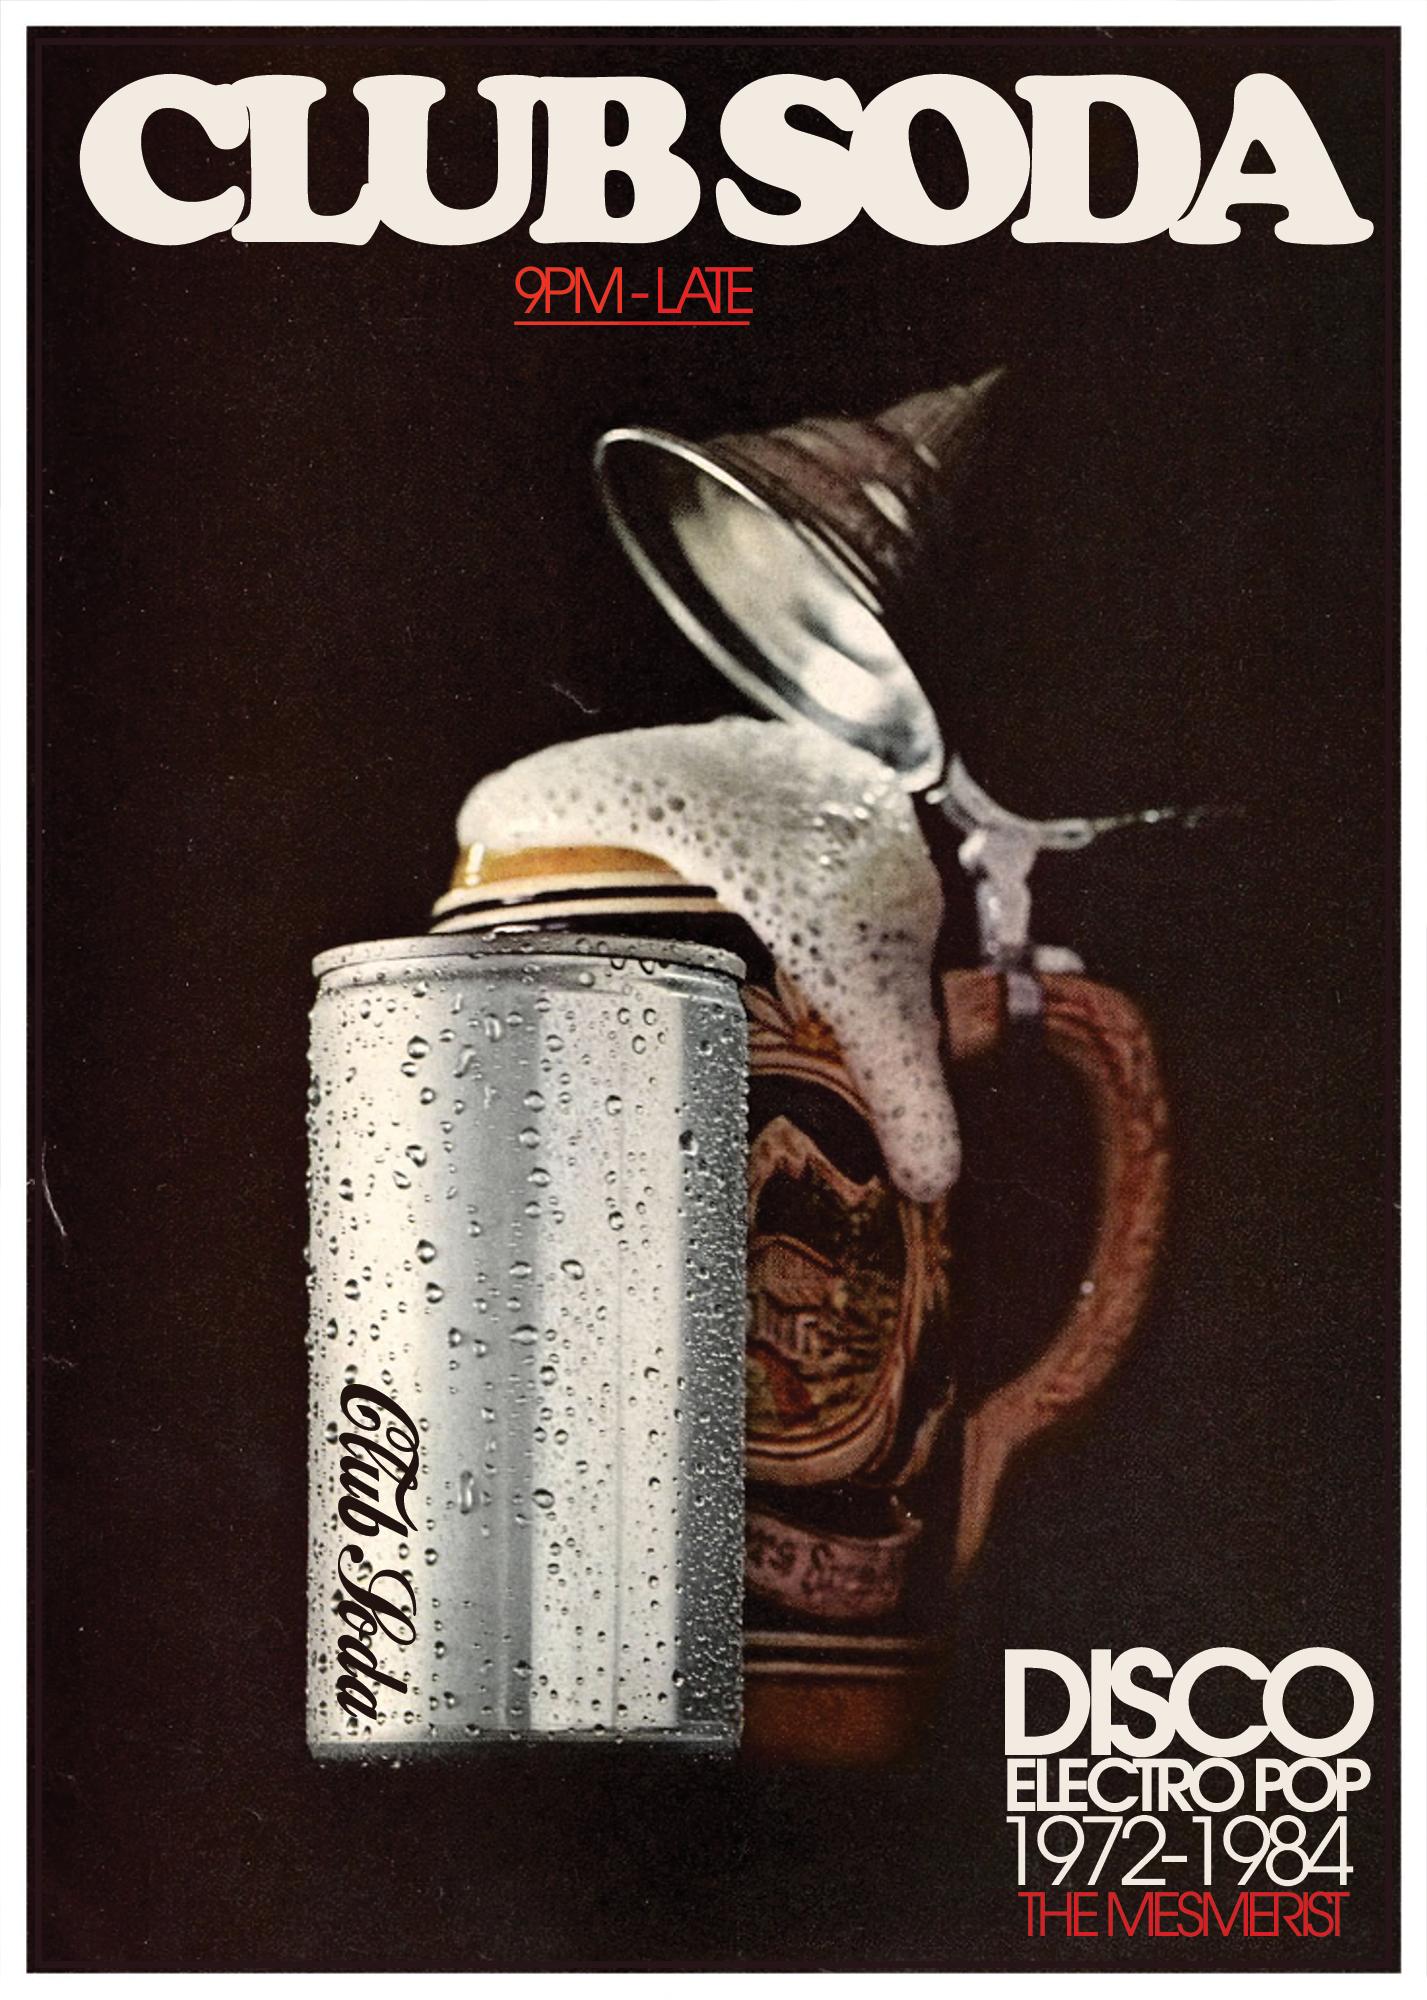 Club-Soda.NO-DATE.Mesmerist.png